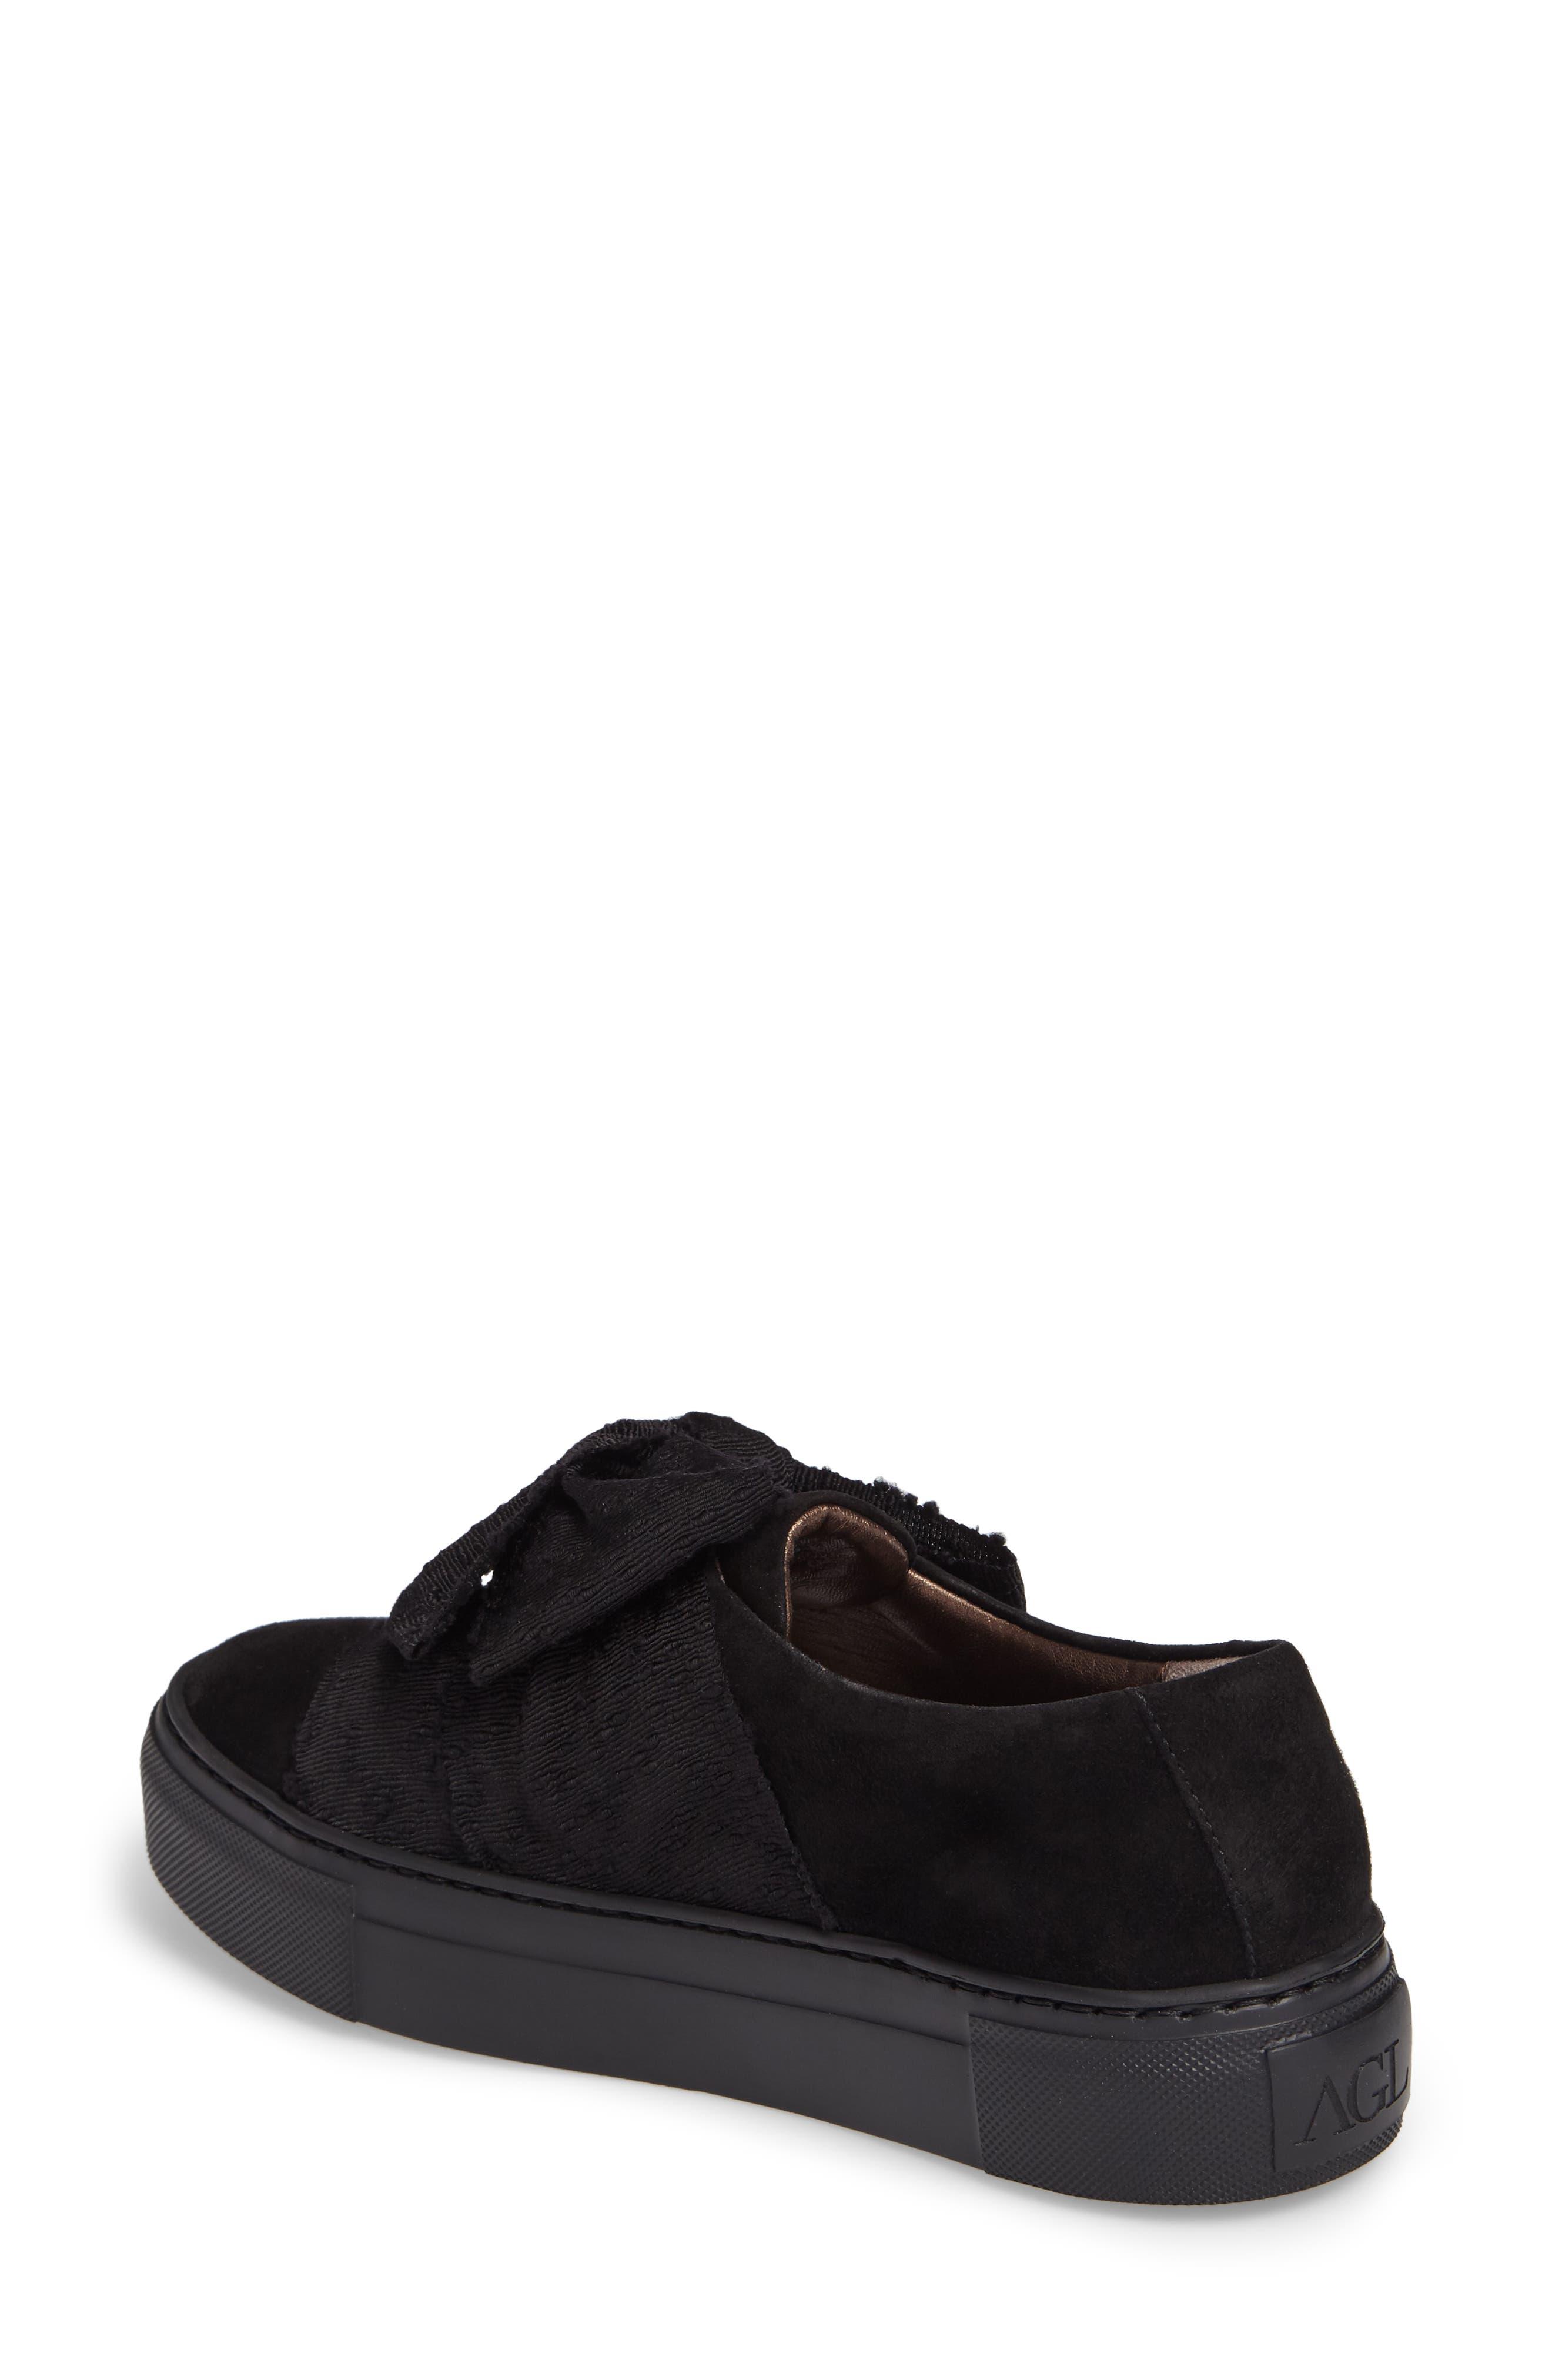 Alternate Image 2  - AGL Bow Platform Sneaker (Women)